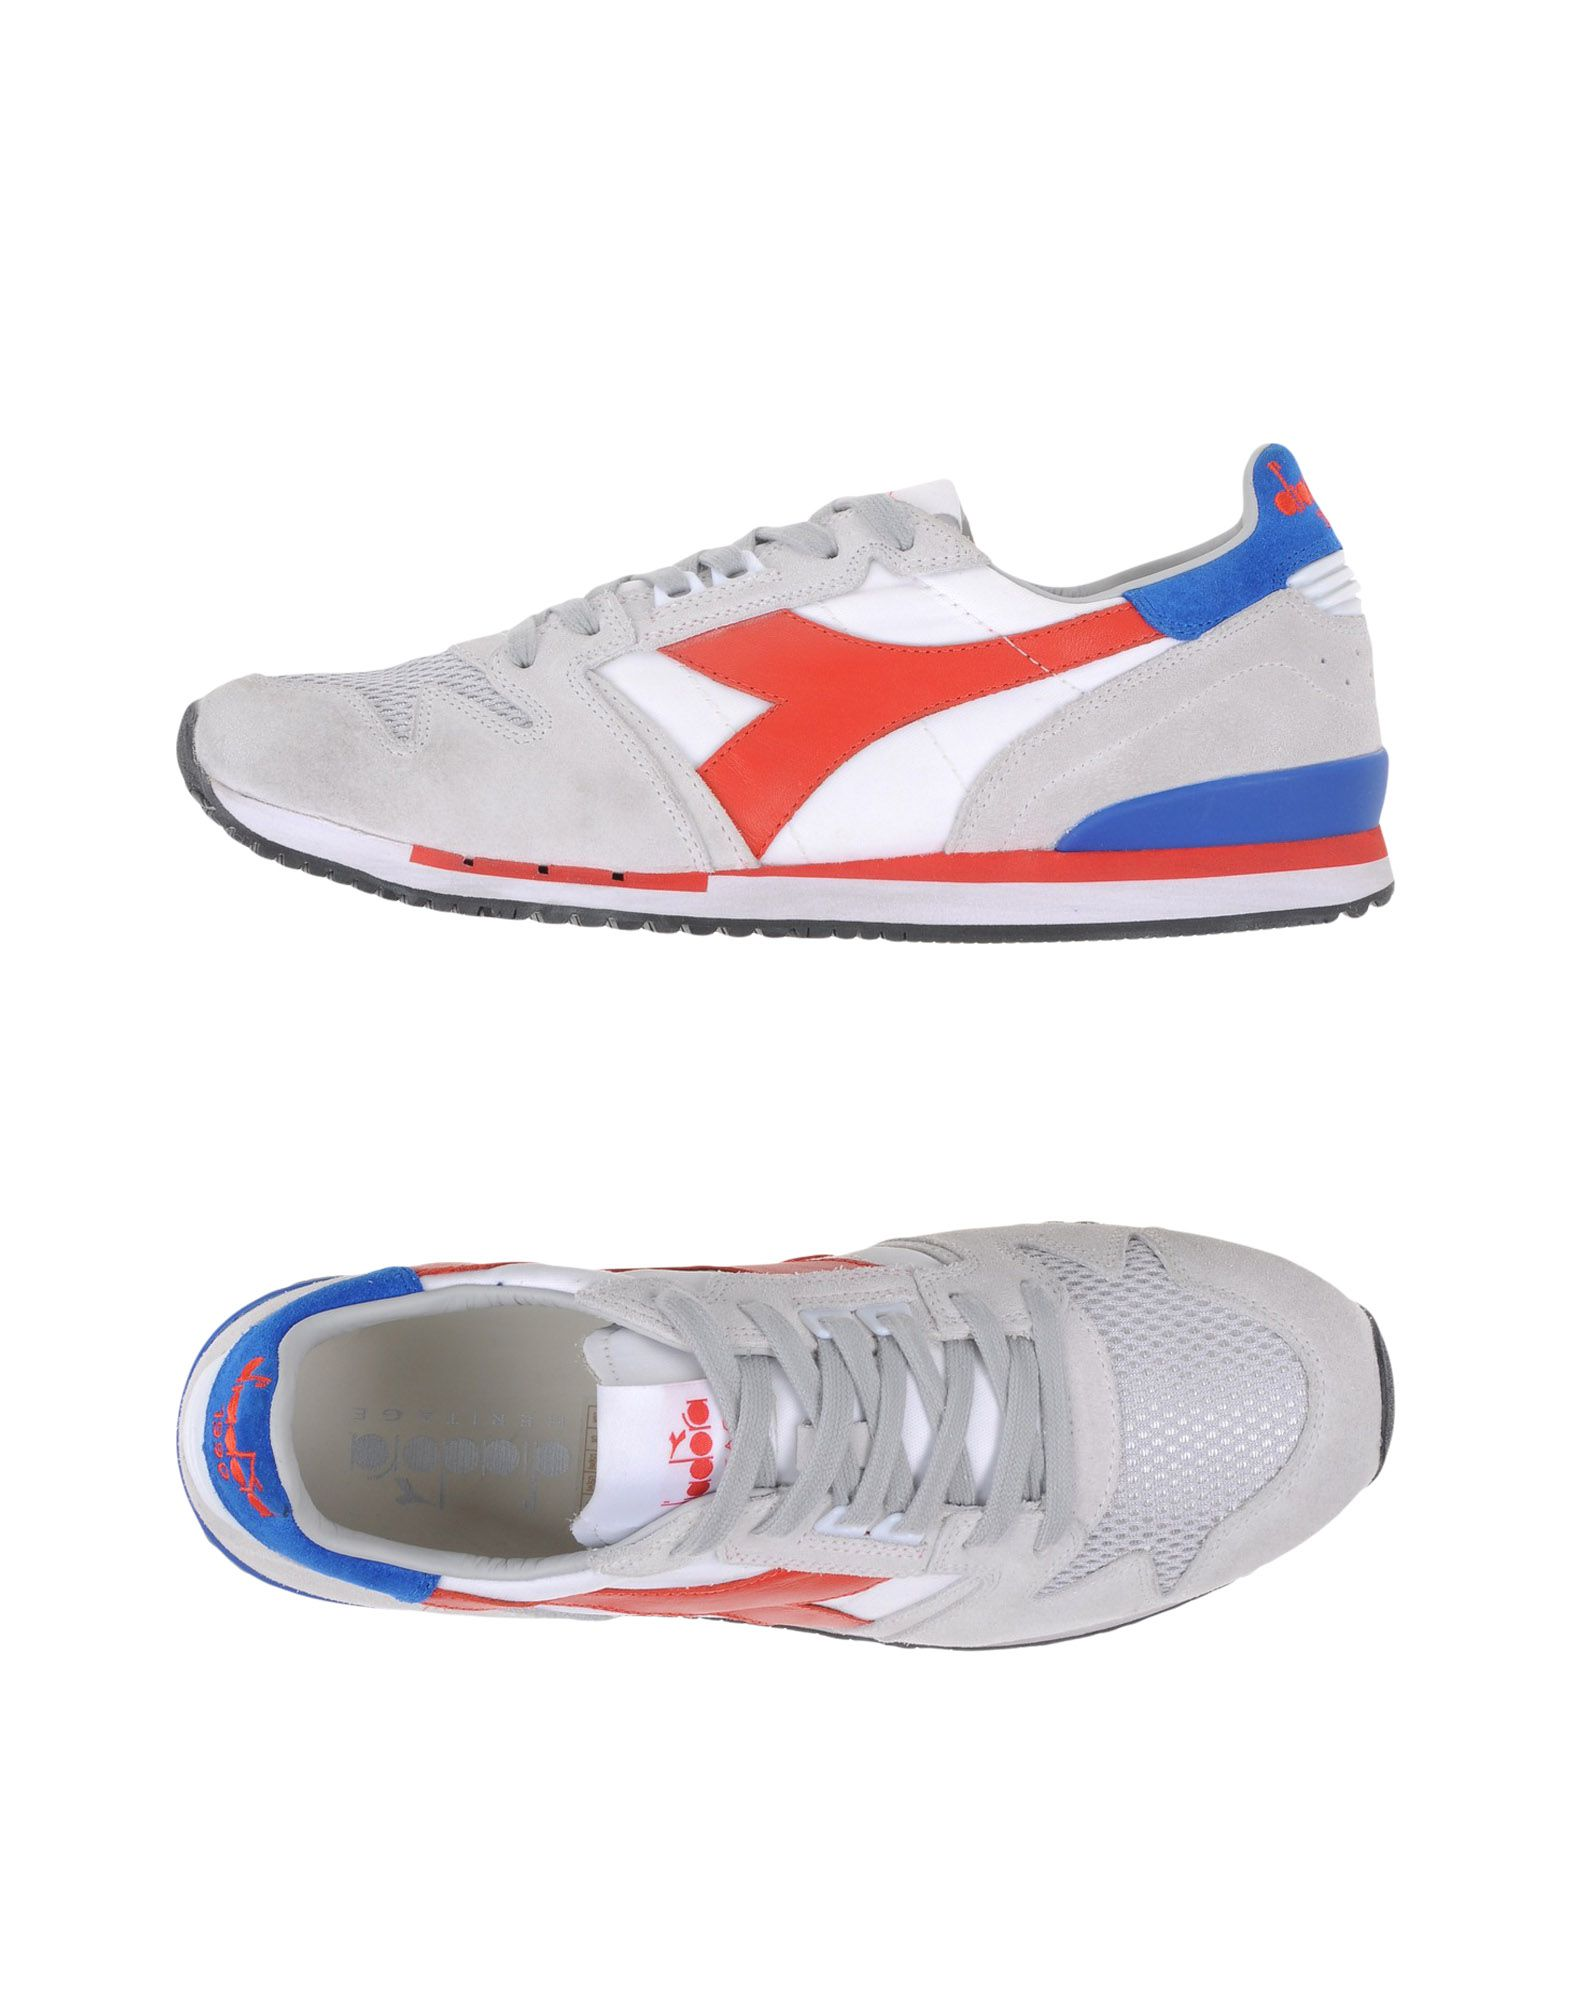 Sneakers Diadora Heritage Trident Nyl Sw - Homme - Sneakers Diadora Heritage sur